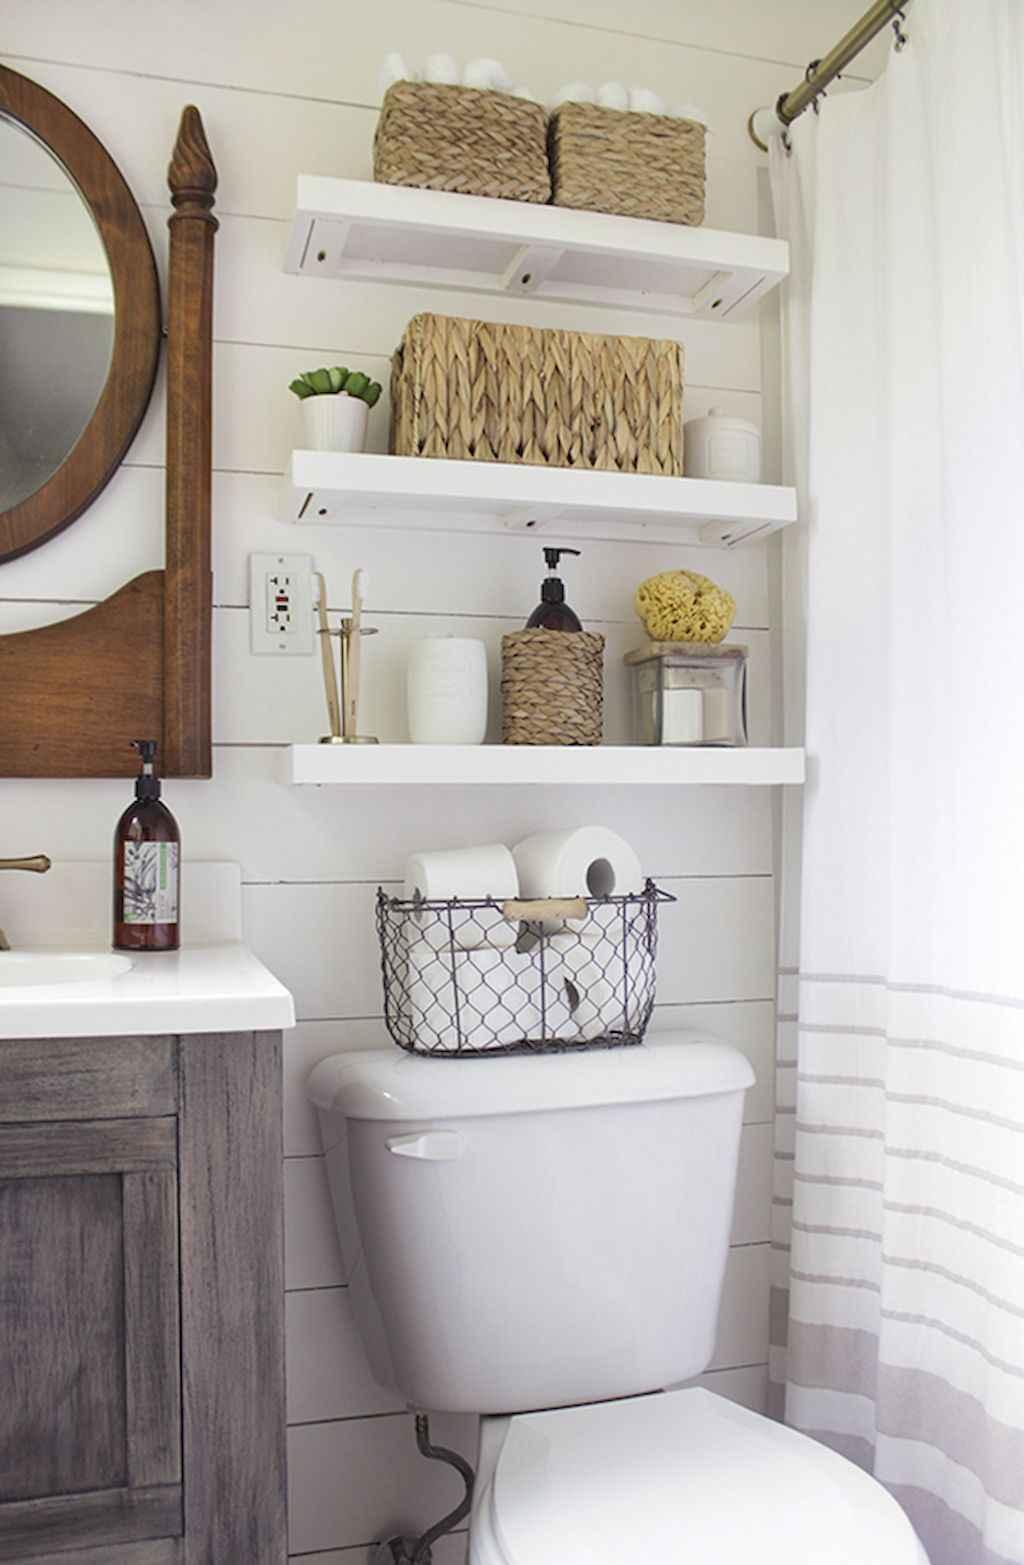 Cool bathroom storage shelves organization ideas (50)